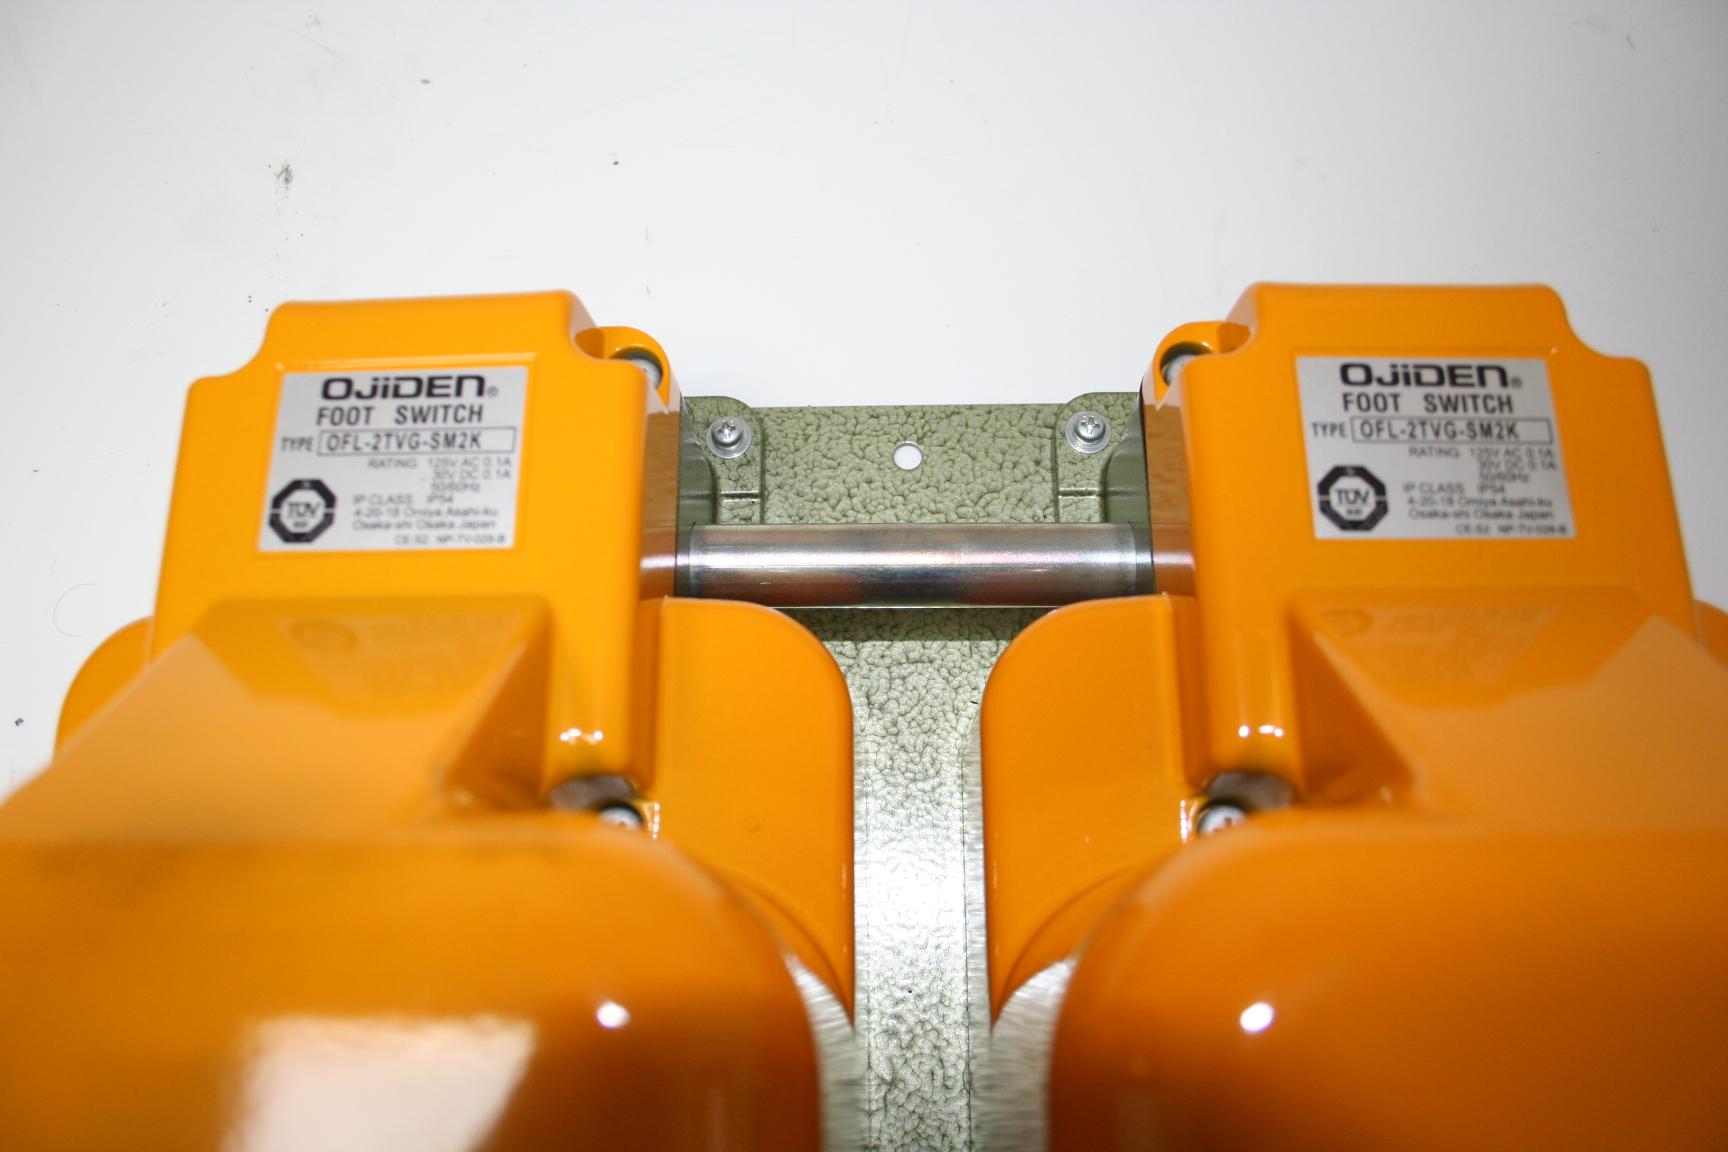 Ojiden Foot Switch  OFL-2TVG-SM2K 3